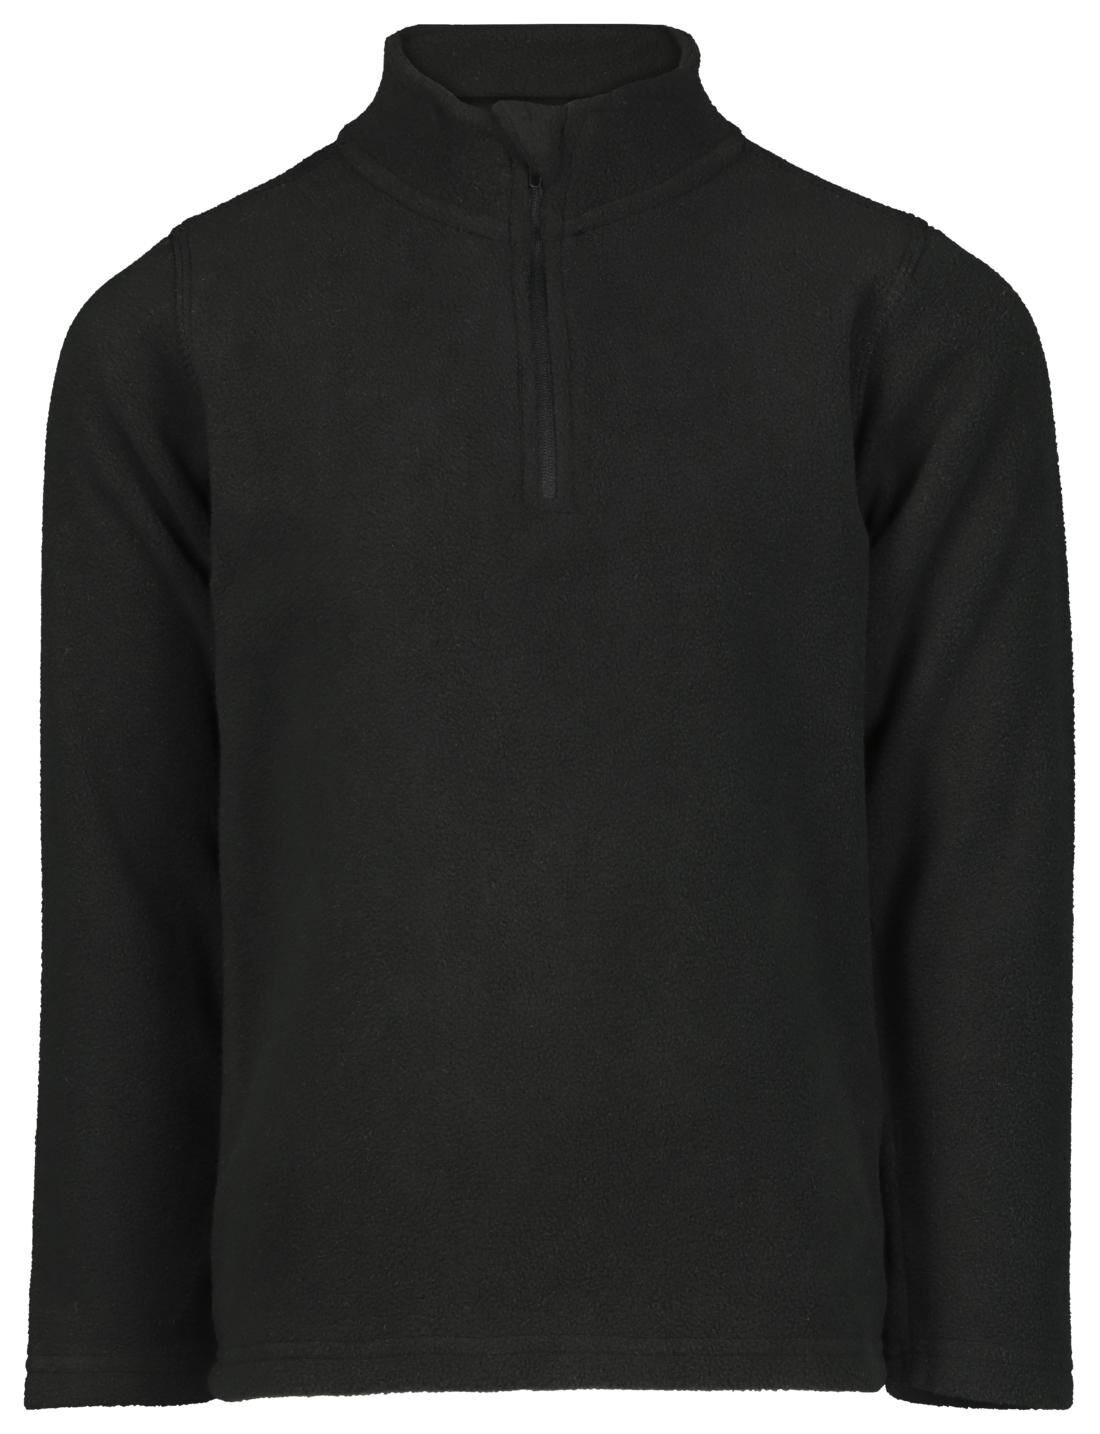 HEMA Kinder Skipully Fleece Zwart (zwart)